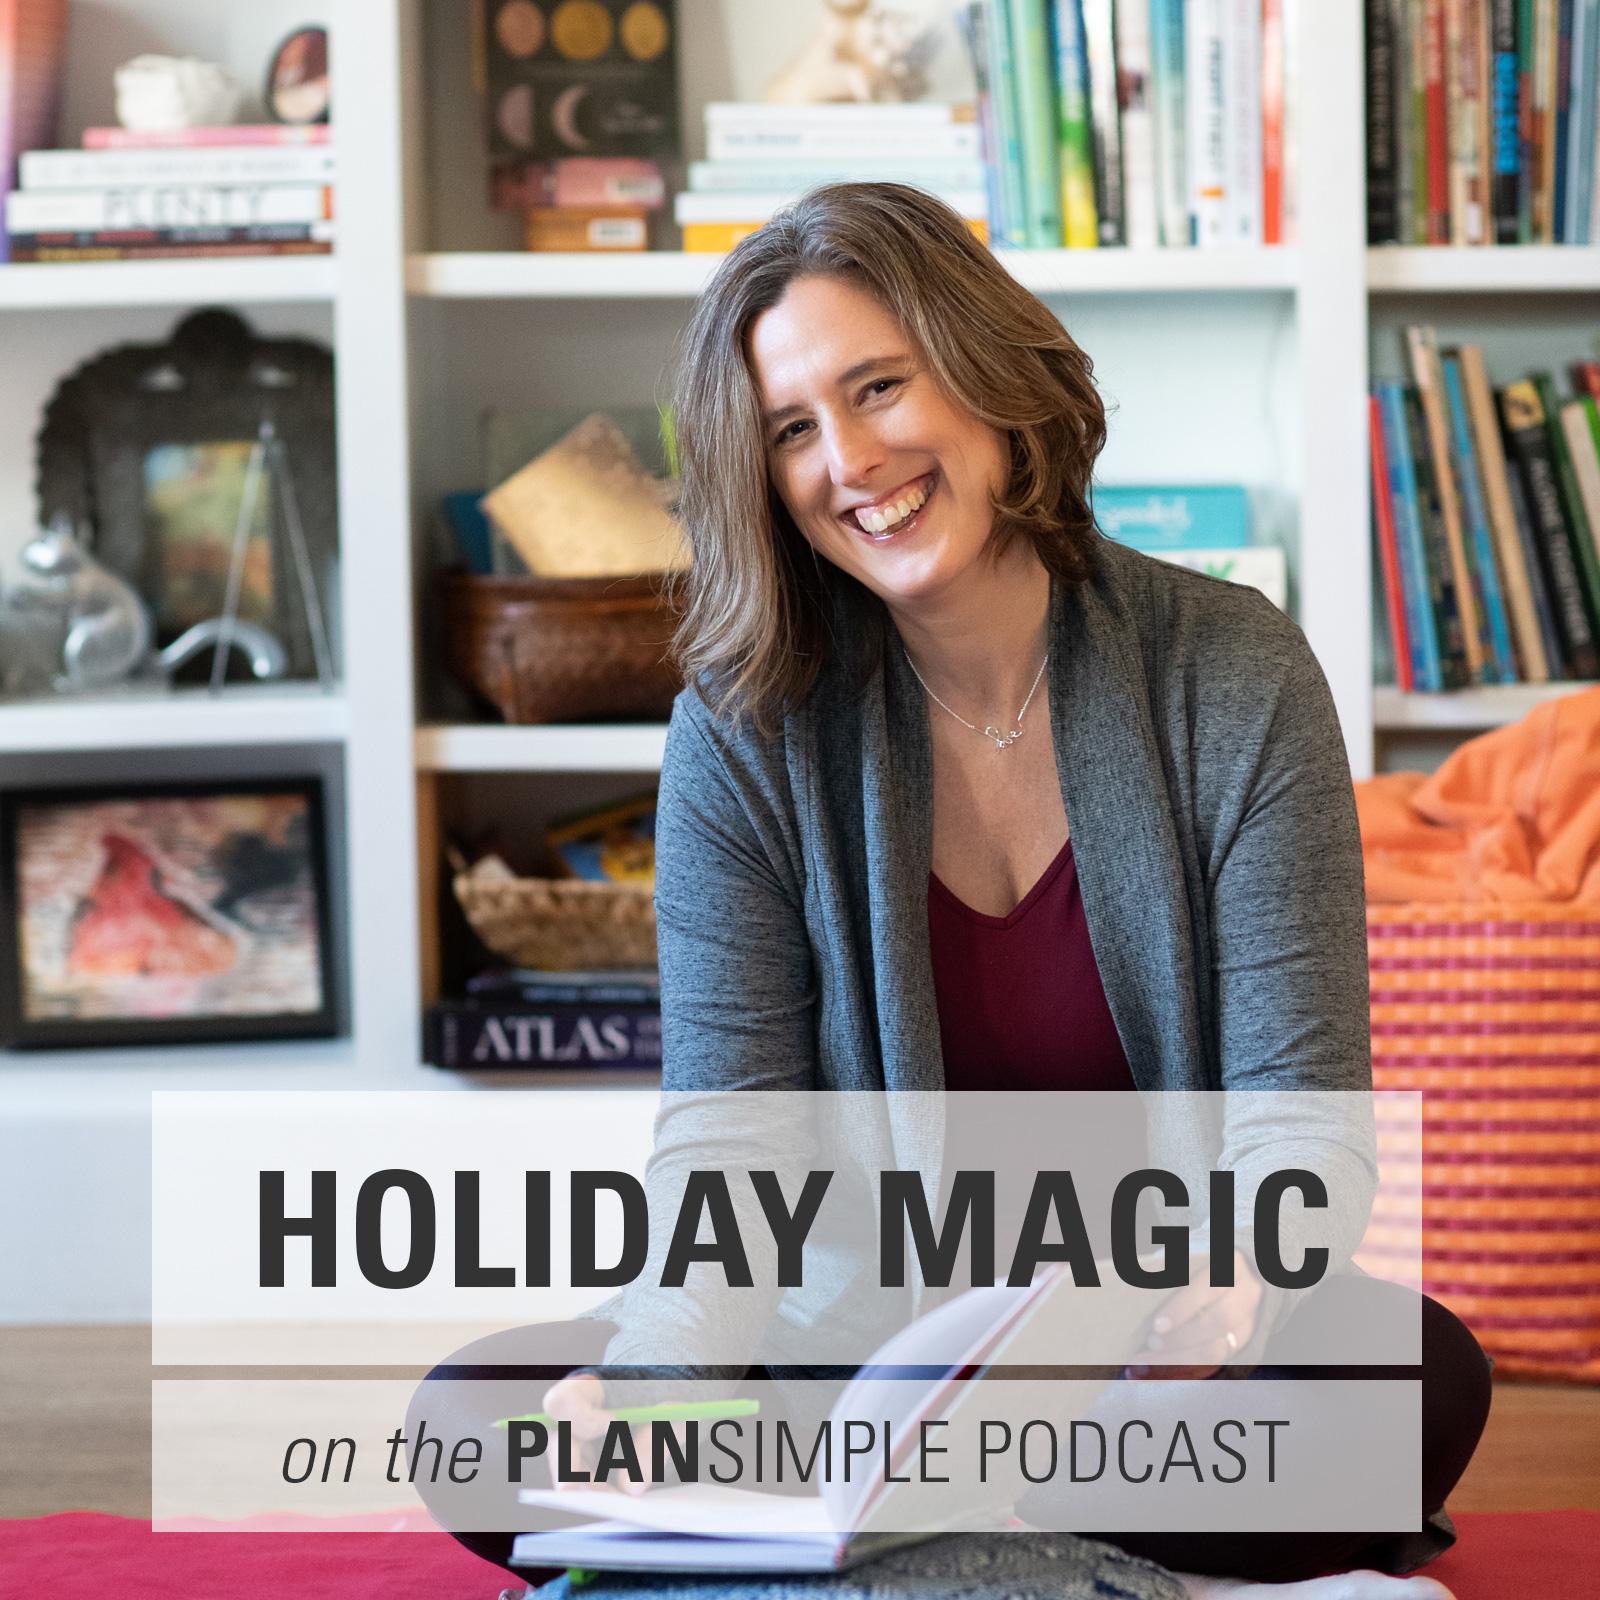 Holiday Magic With Mia Moran